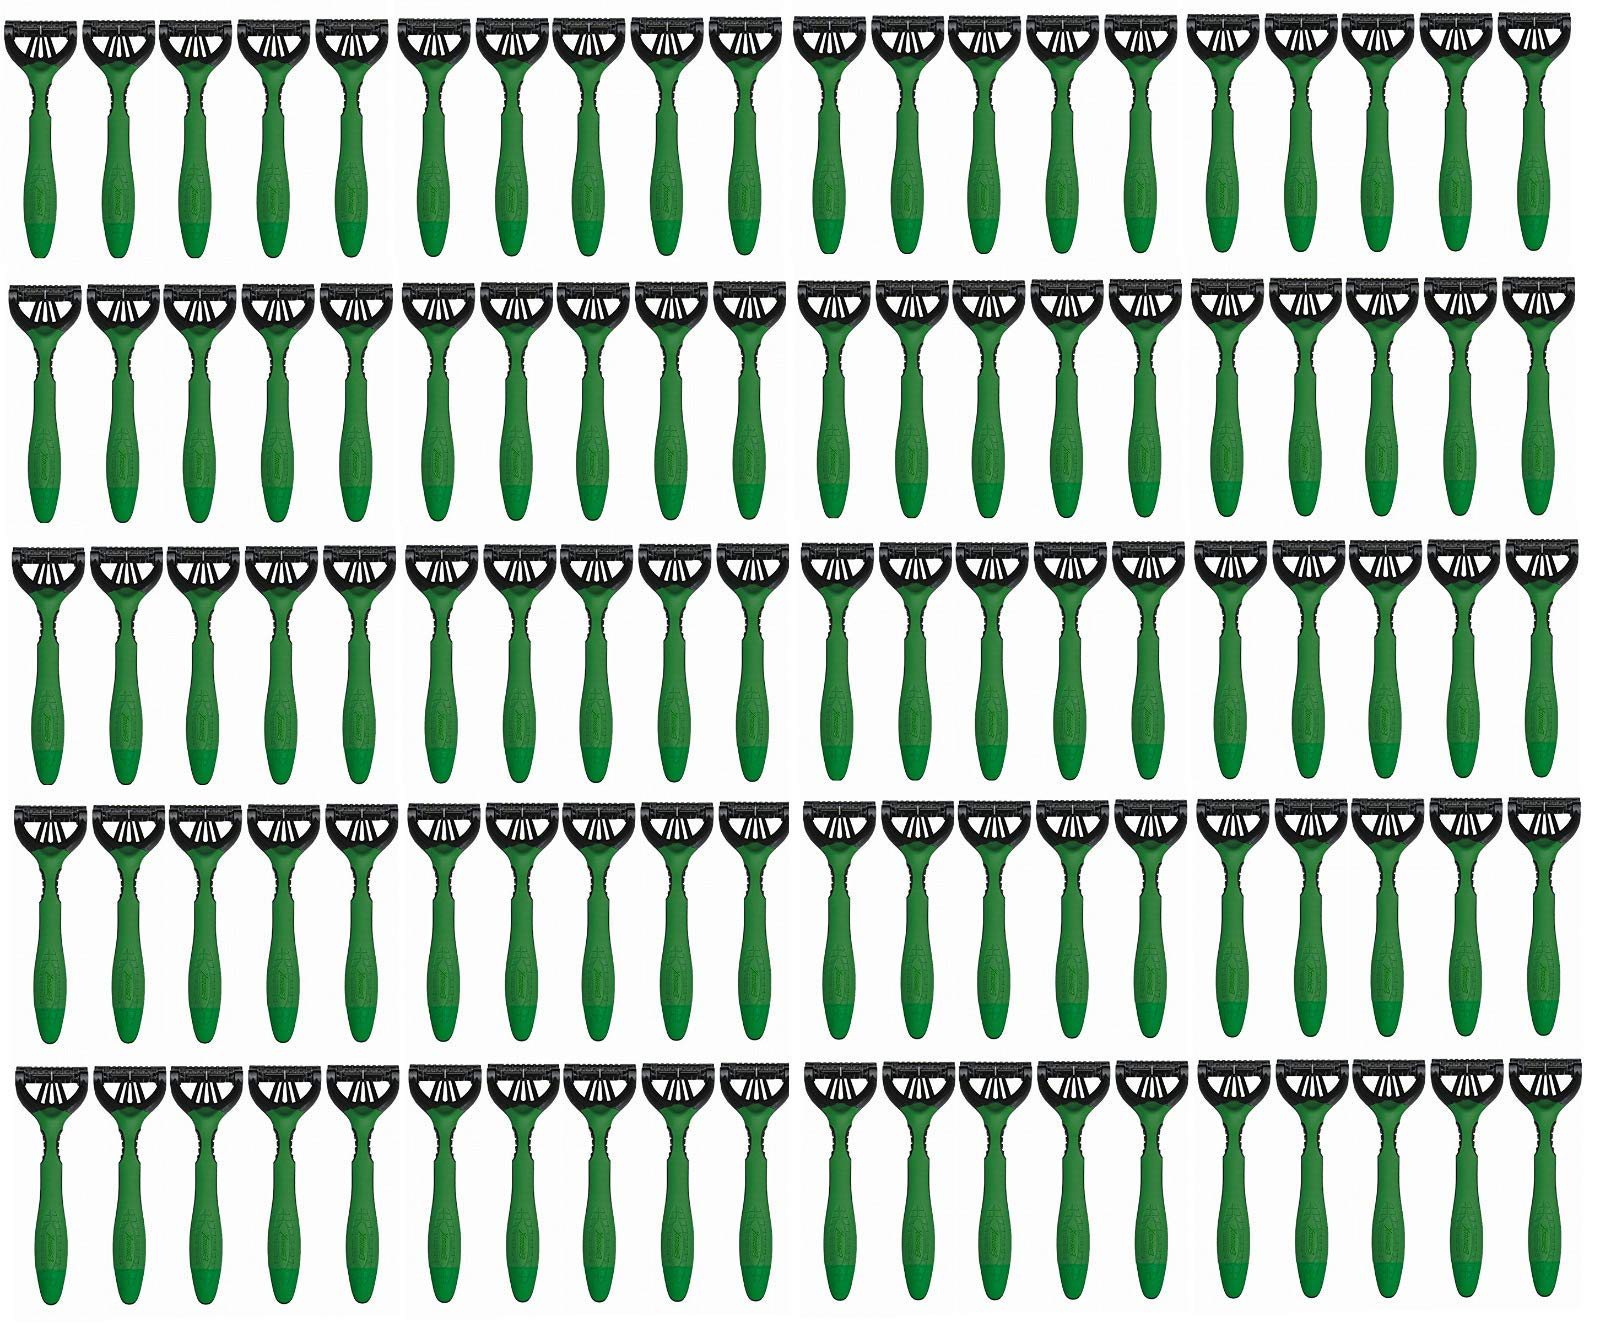 100 (Pack) - Schick Xtreme 3 Disposable Razors Sensitive Aloe Green Bulk by bvcsales